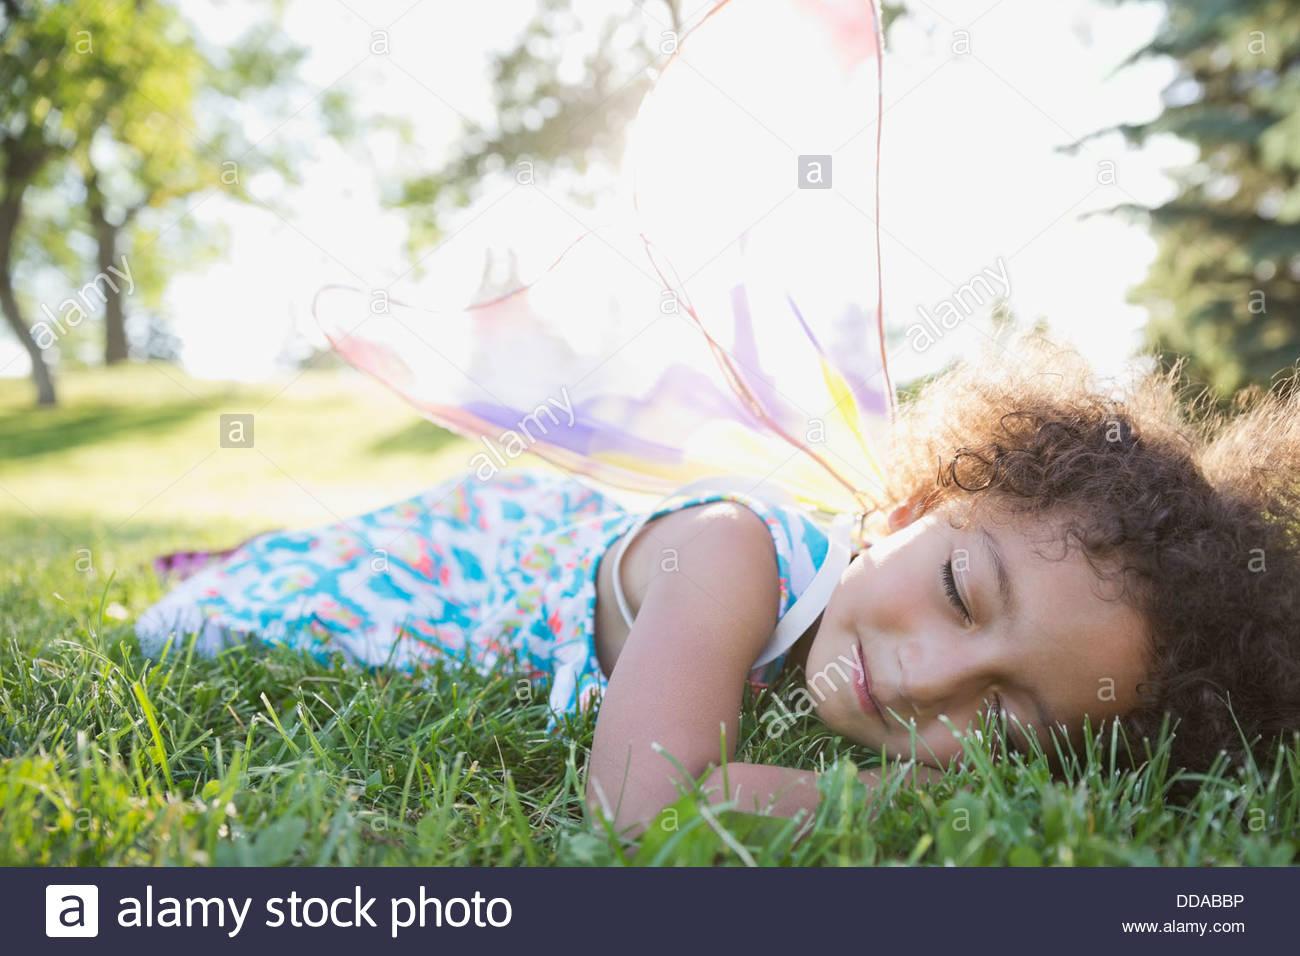 Cute Little Girl Sleeping On Grass Stock Photo Royalty